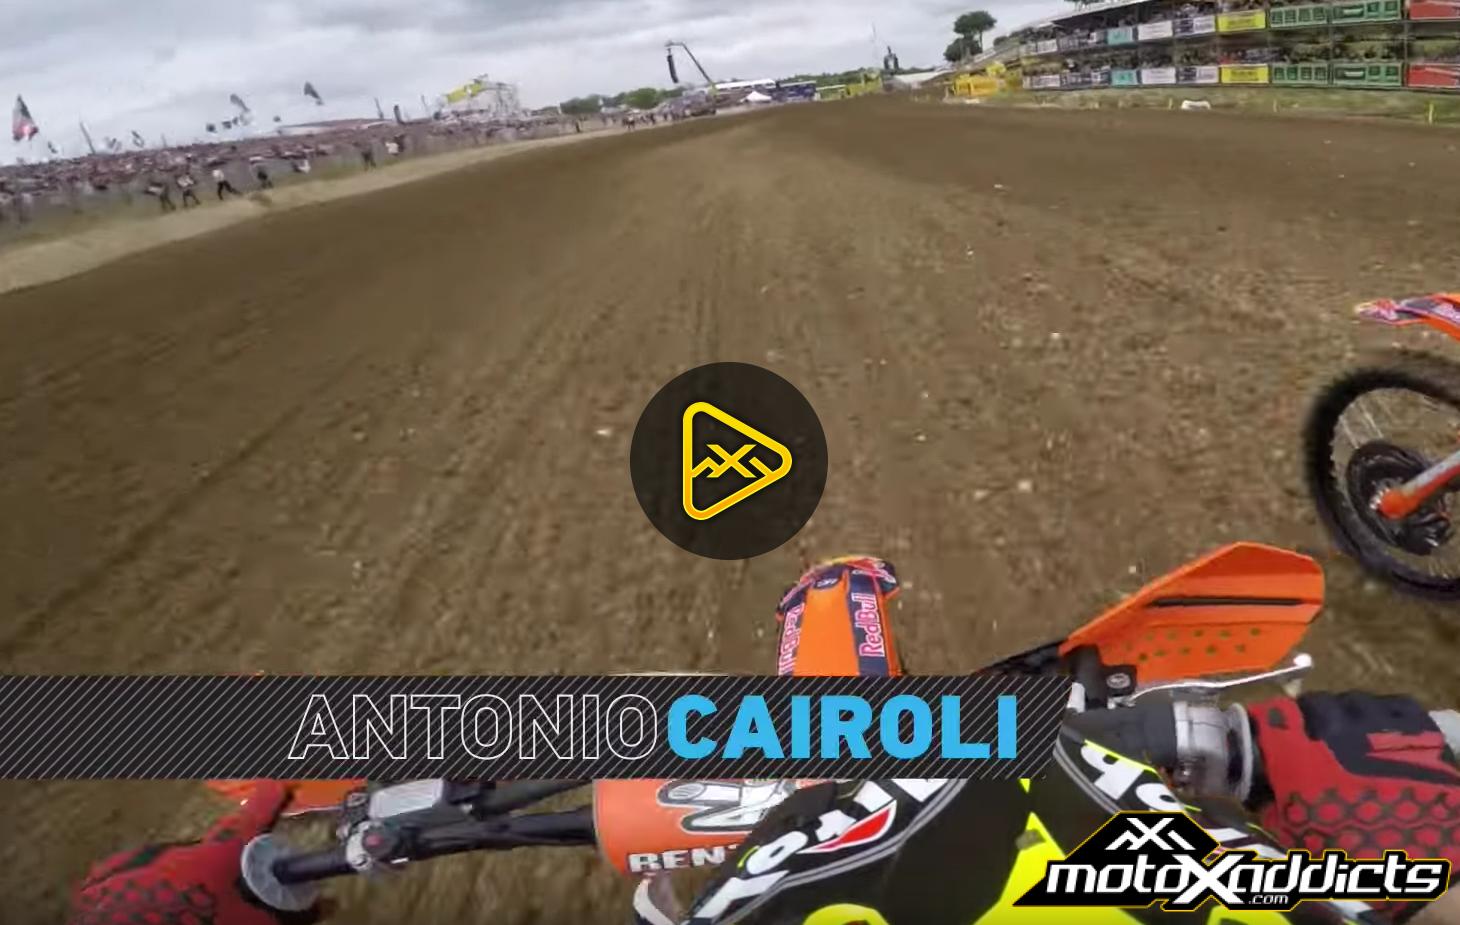 GoPro Helmet Cam: Antonio Cairoli at 2016 MXGP of France